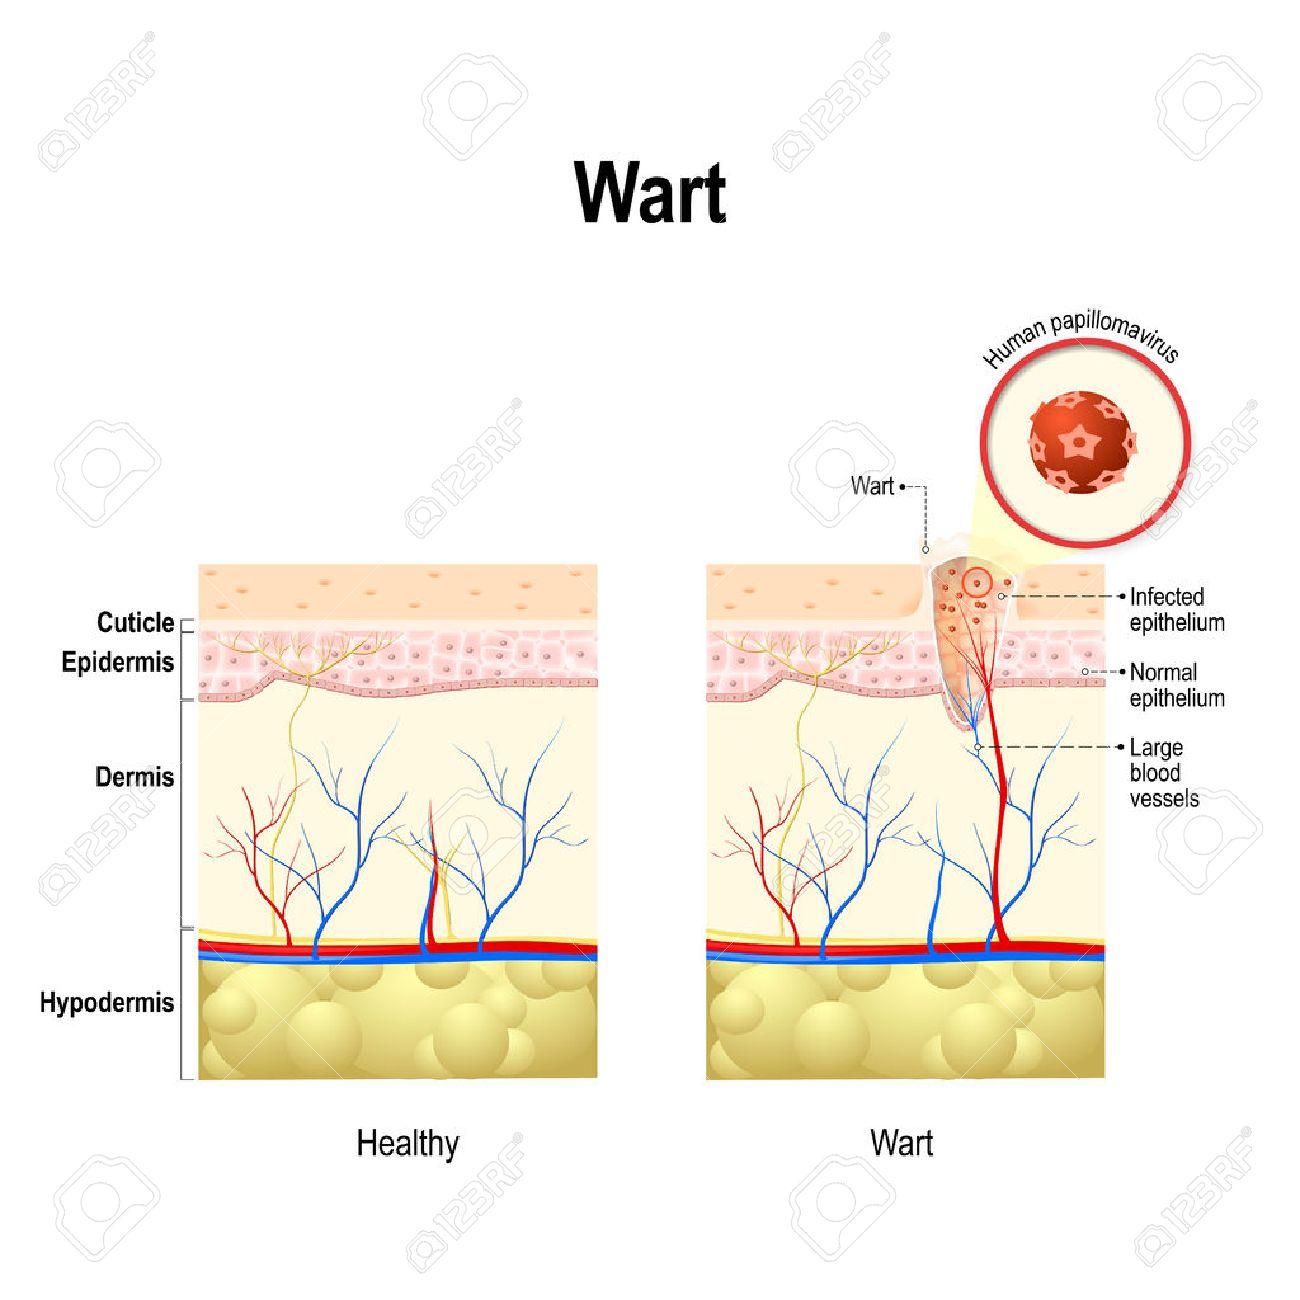 human papilloma virus causing warts)